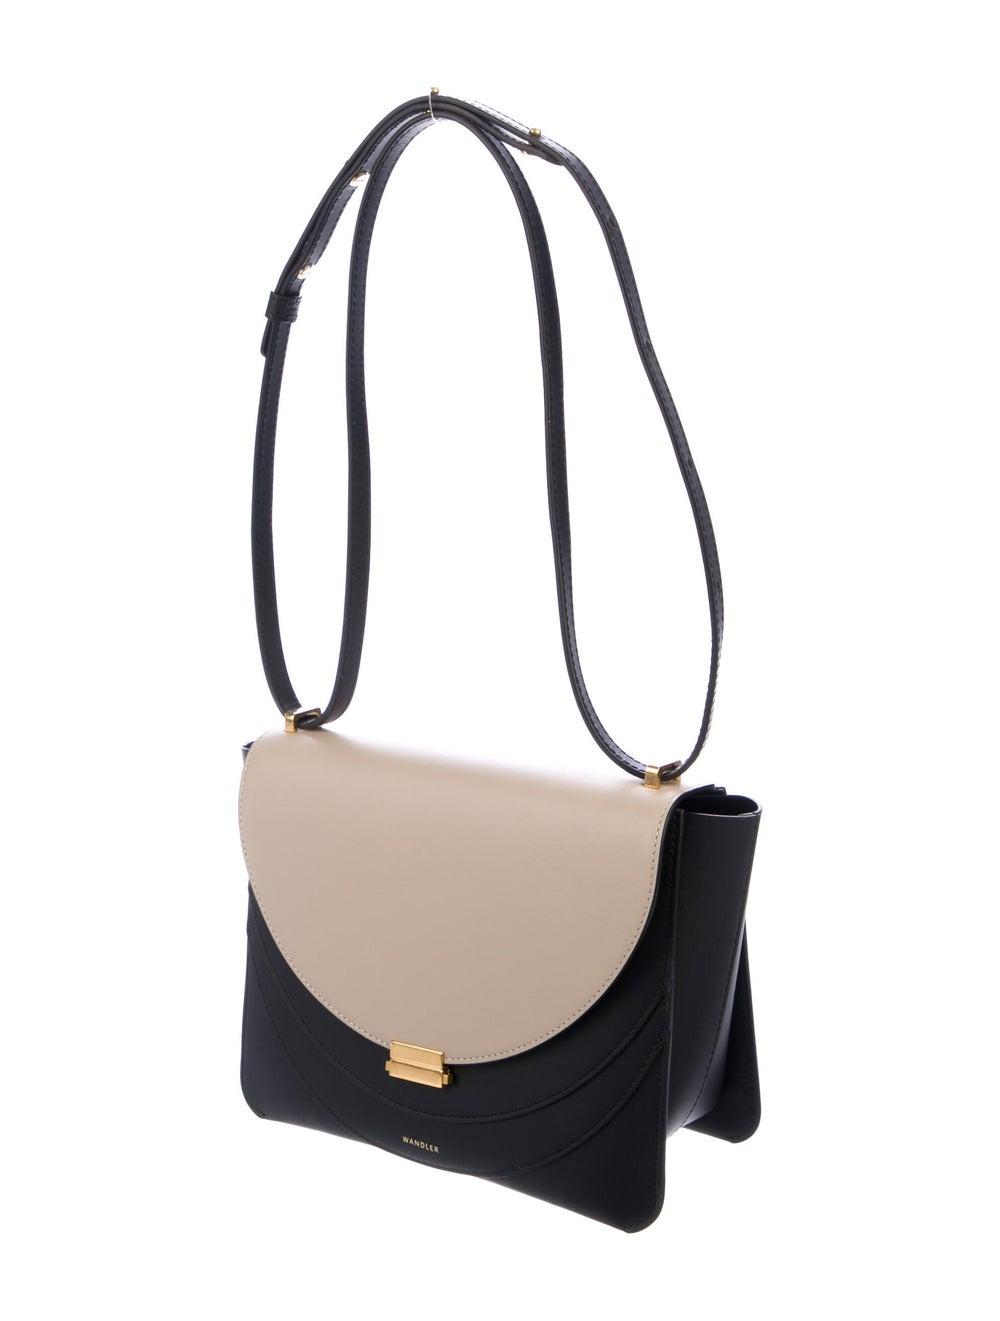 Wandler Leather Colorblock Crossbody Bag Black - image 3